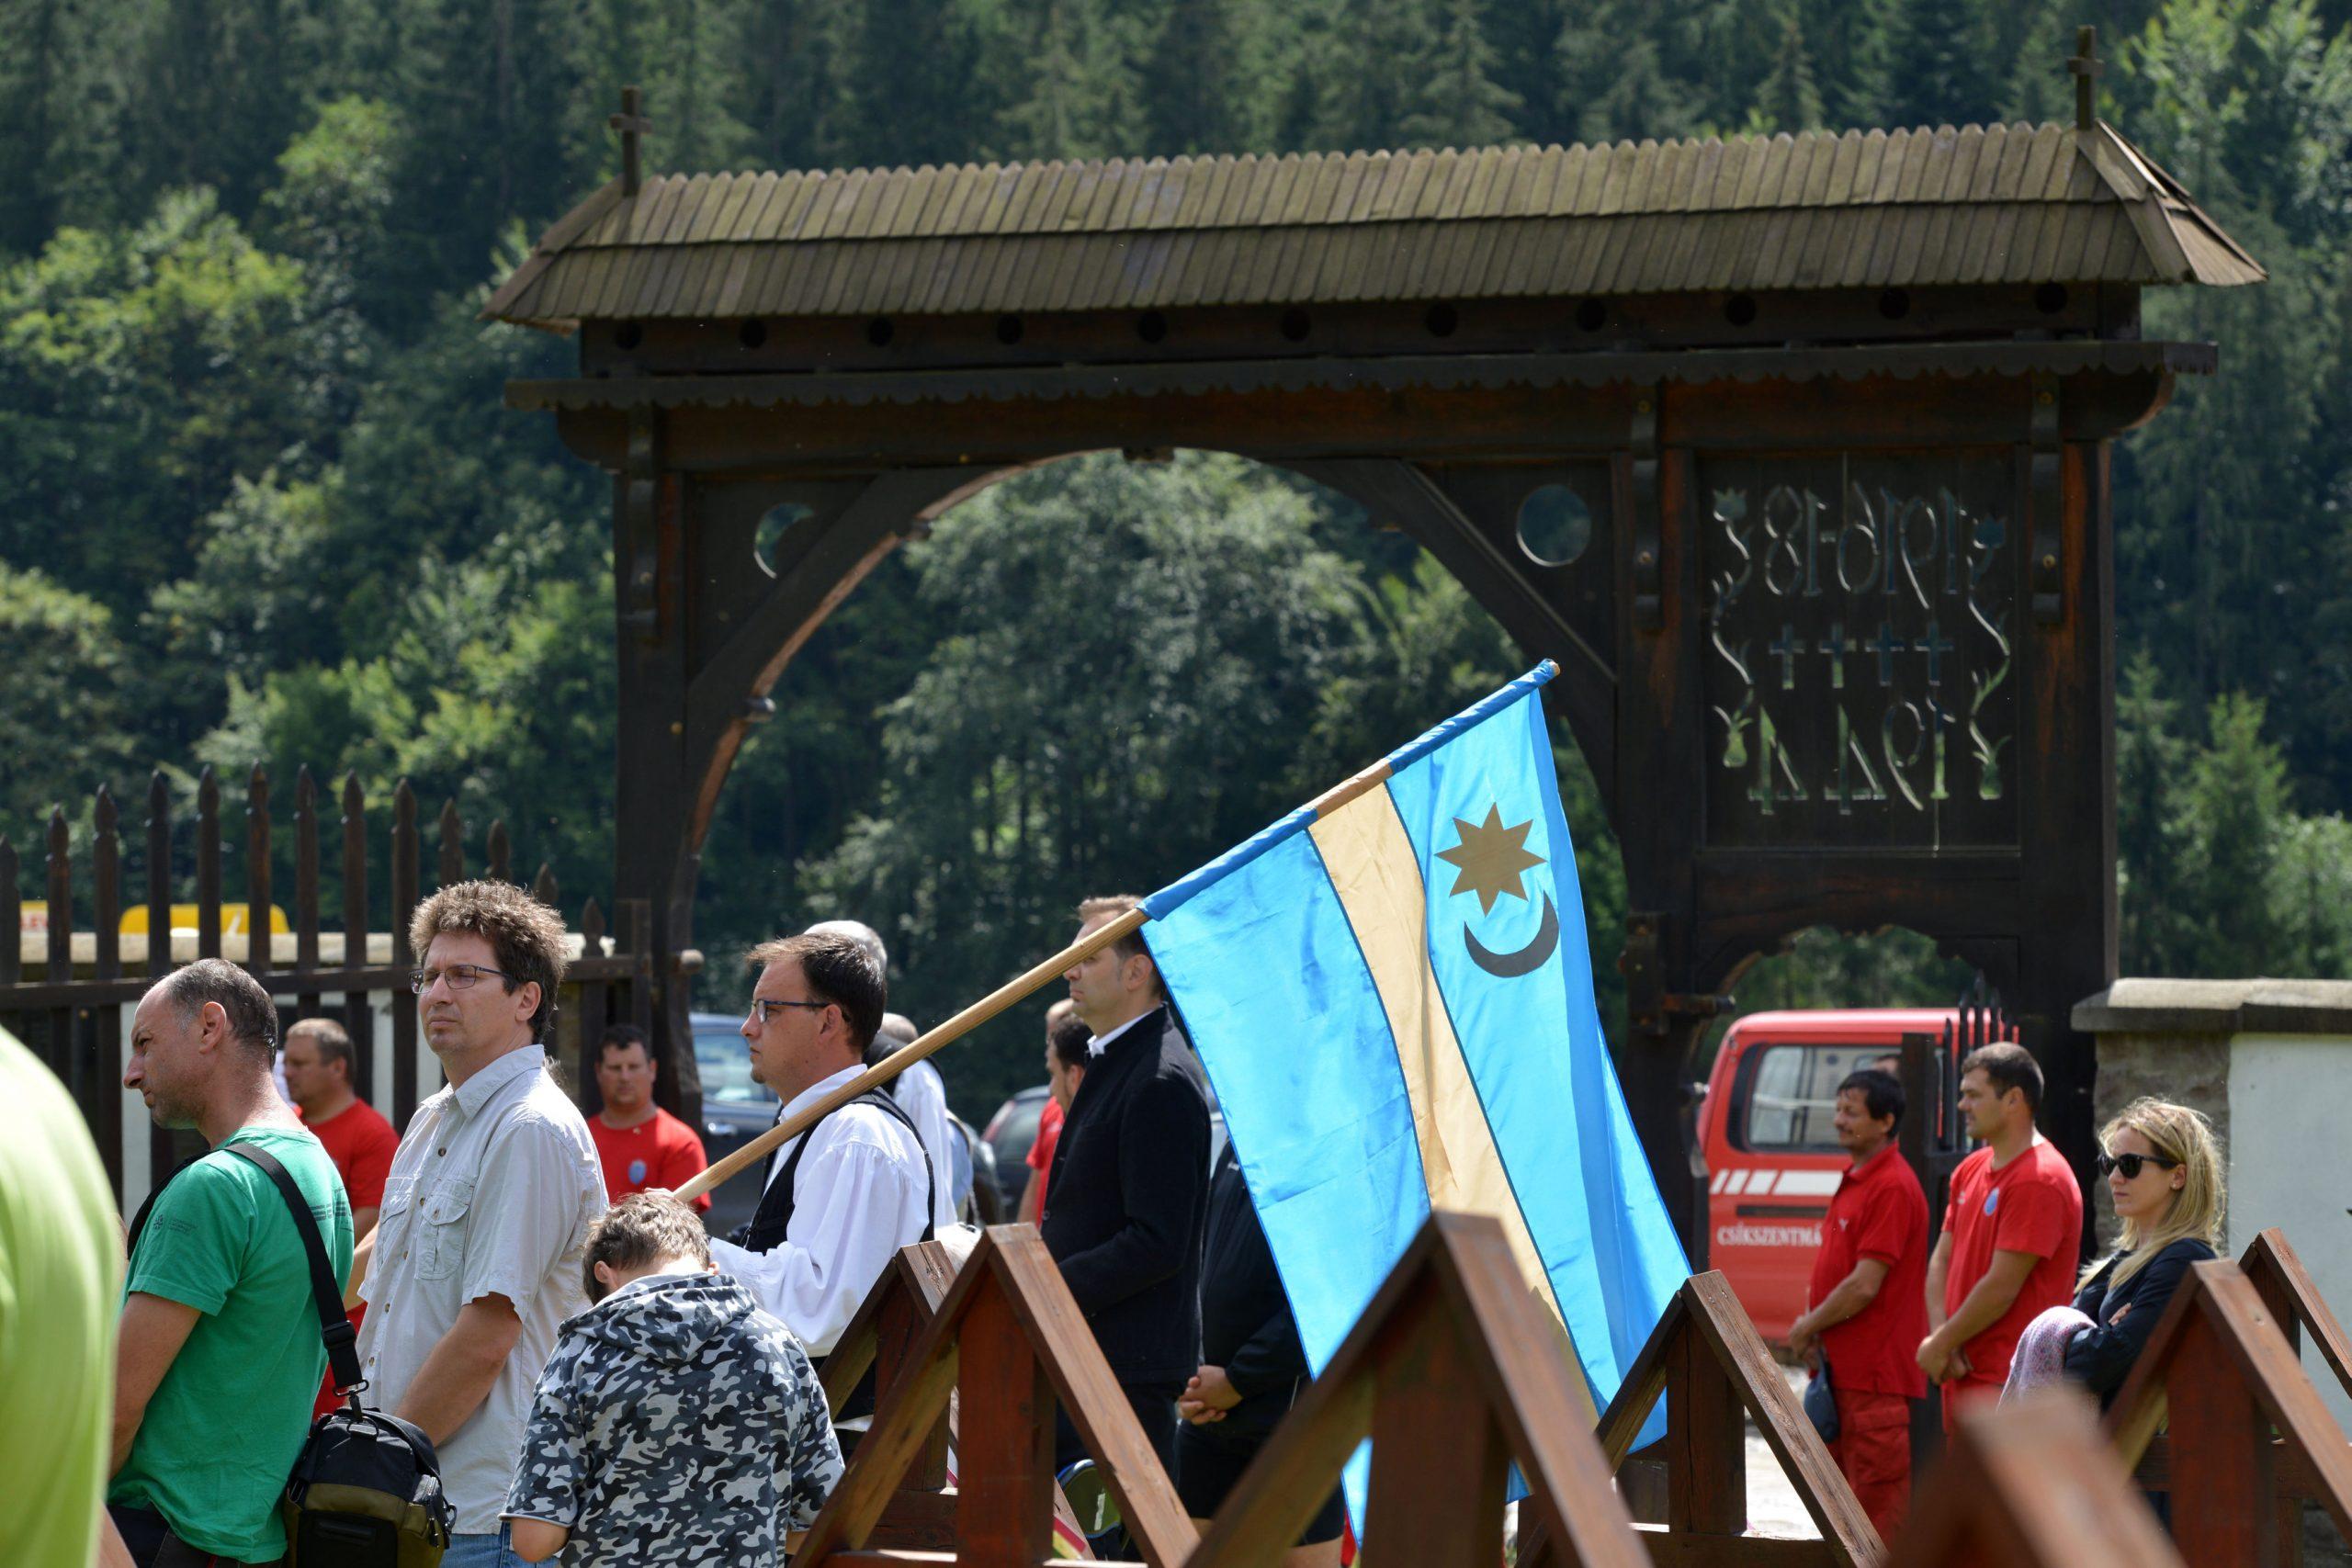 Half of Romania think Hungary wants to take back Transylvania